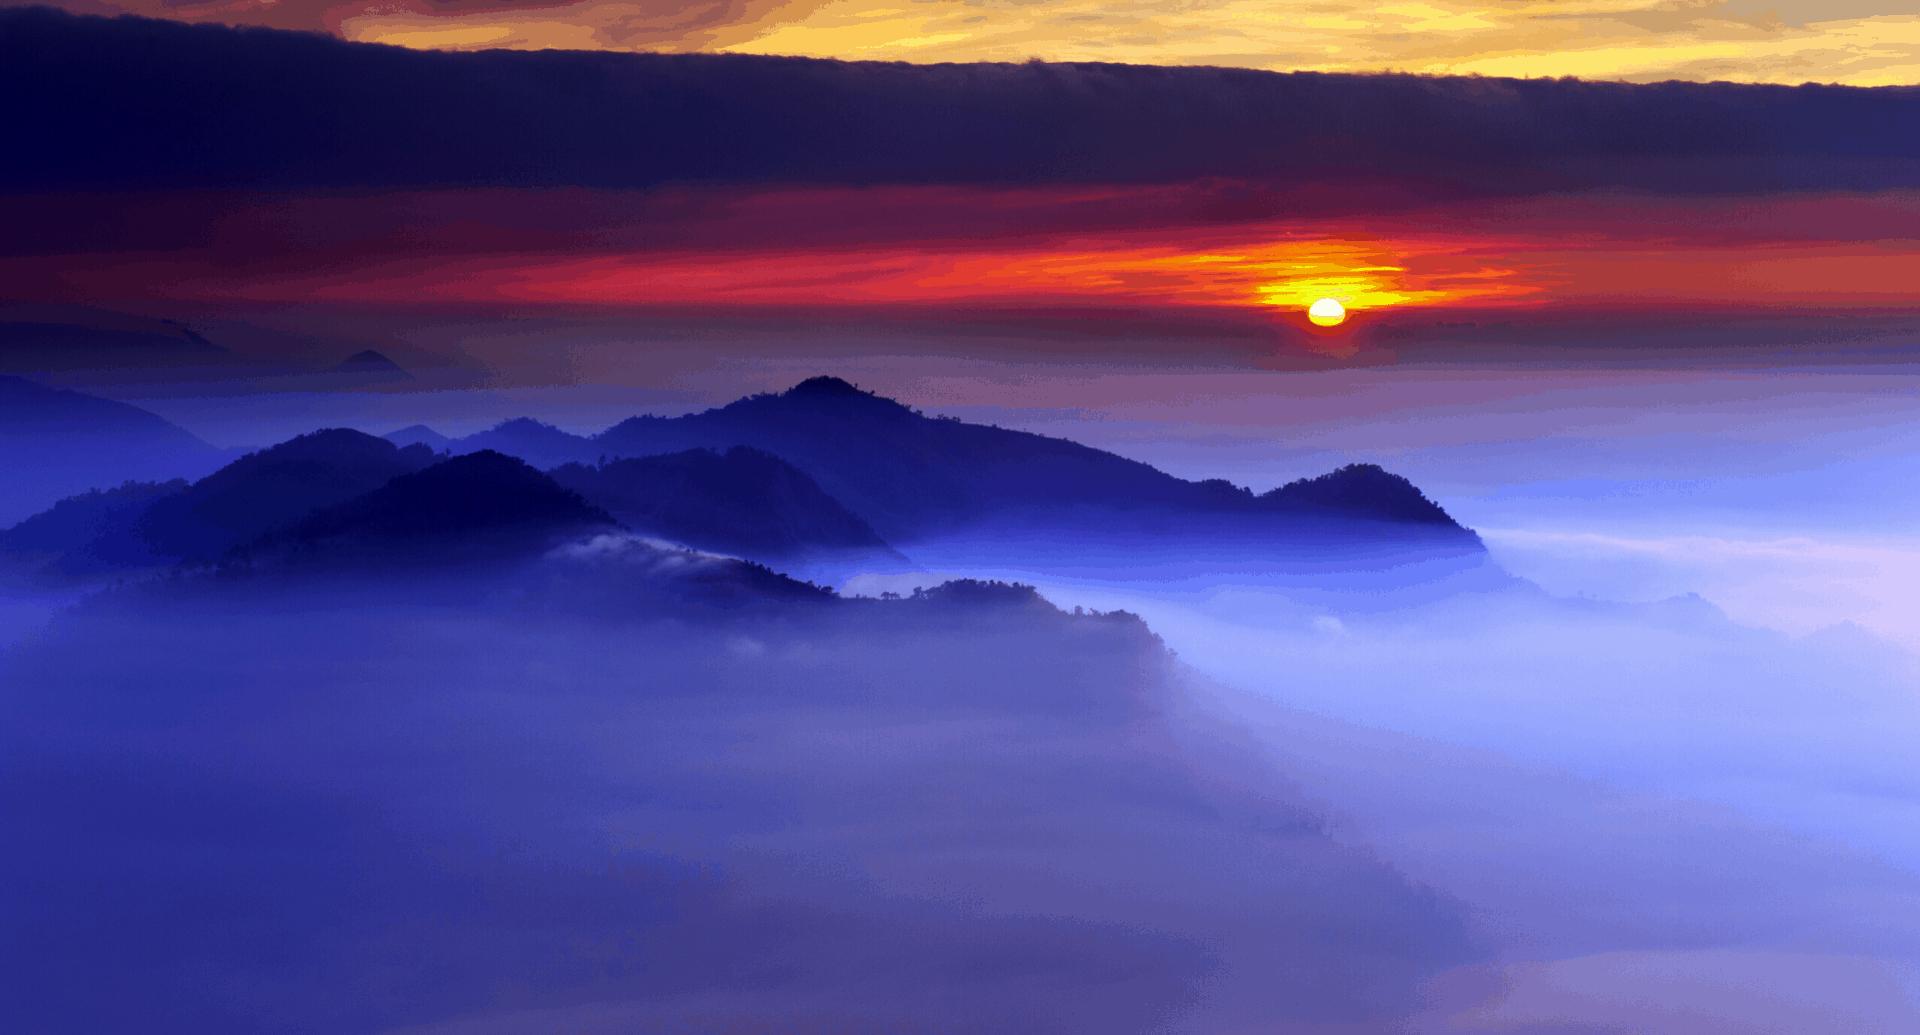 A guide to Alishan National Scenic Area in Alishan Taiwan